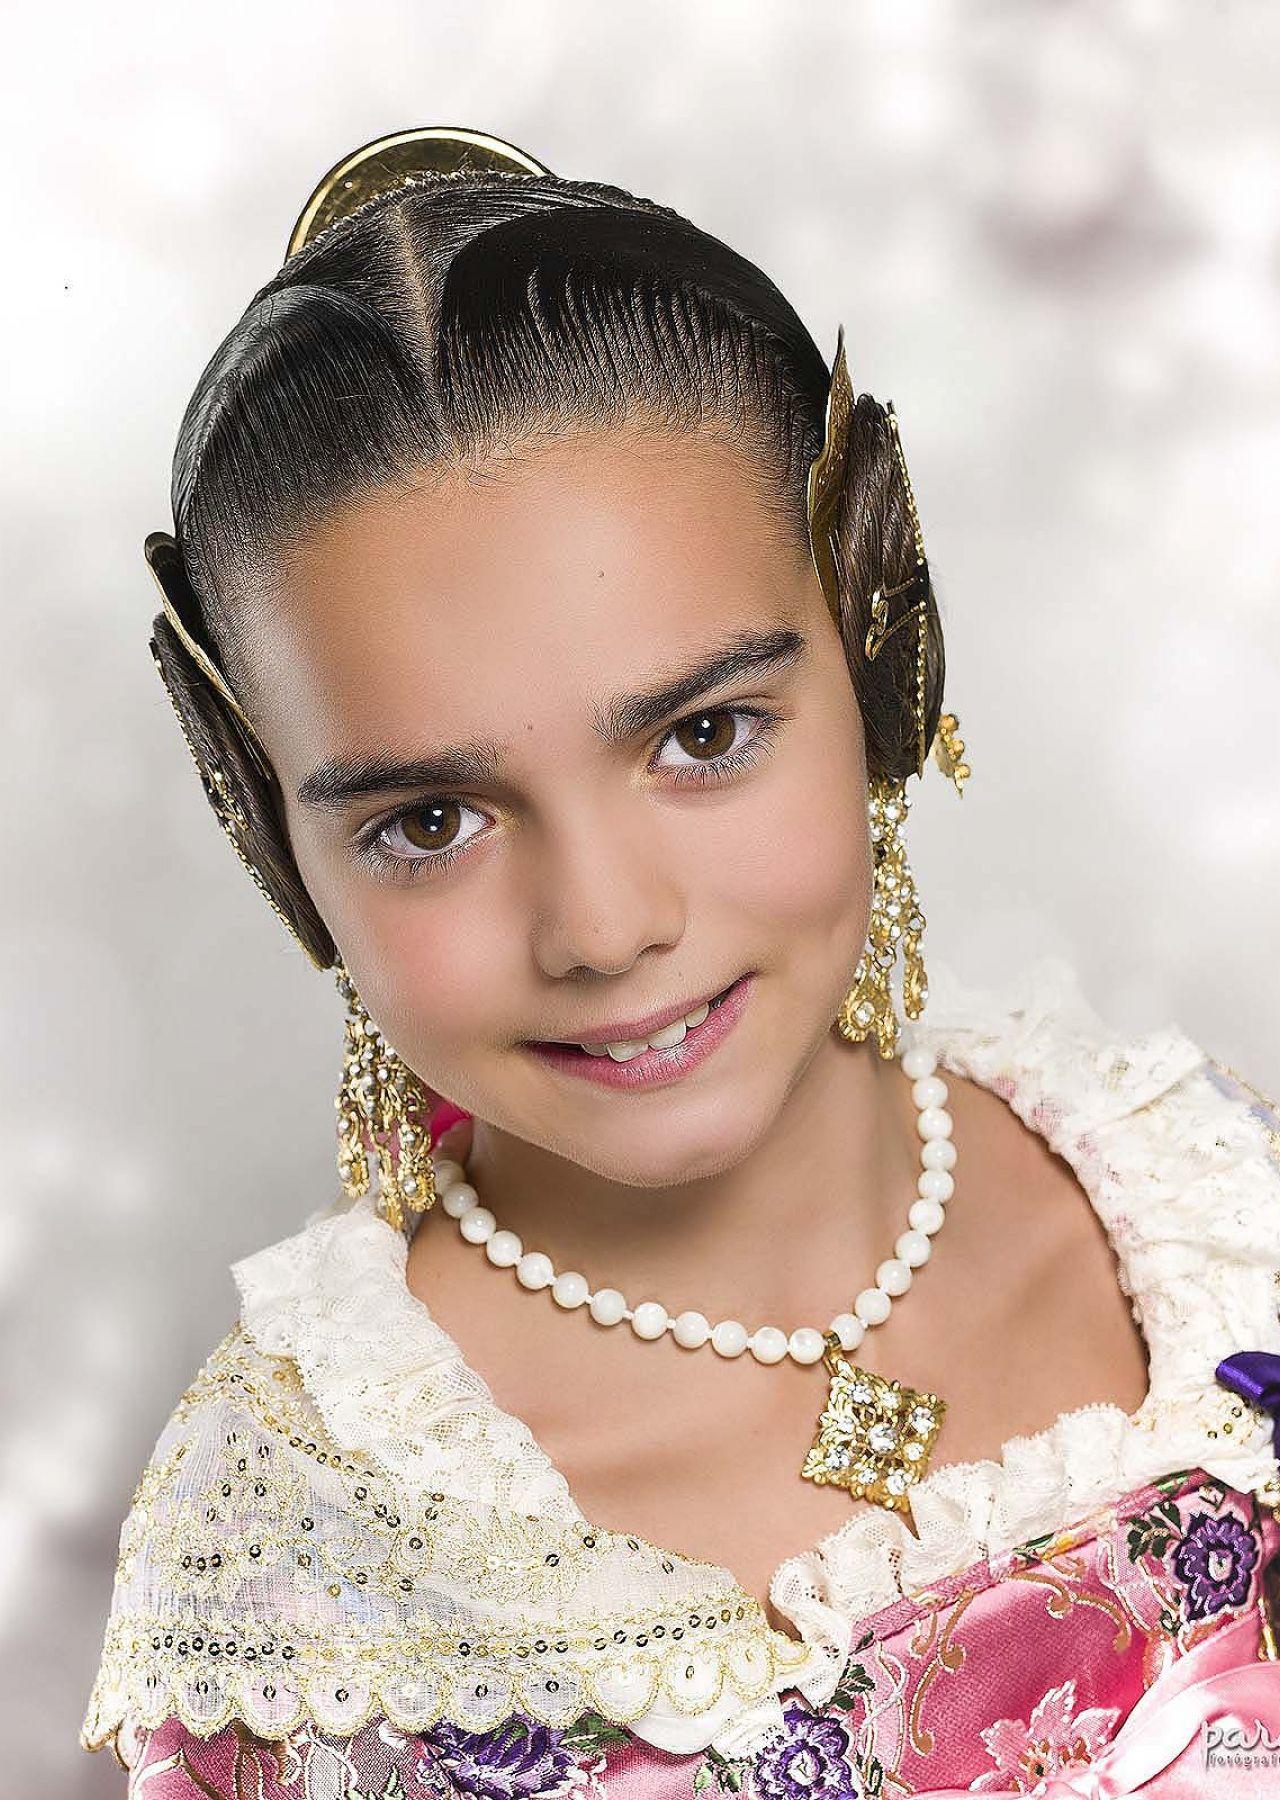 Cristina Luján Raro